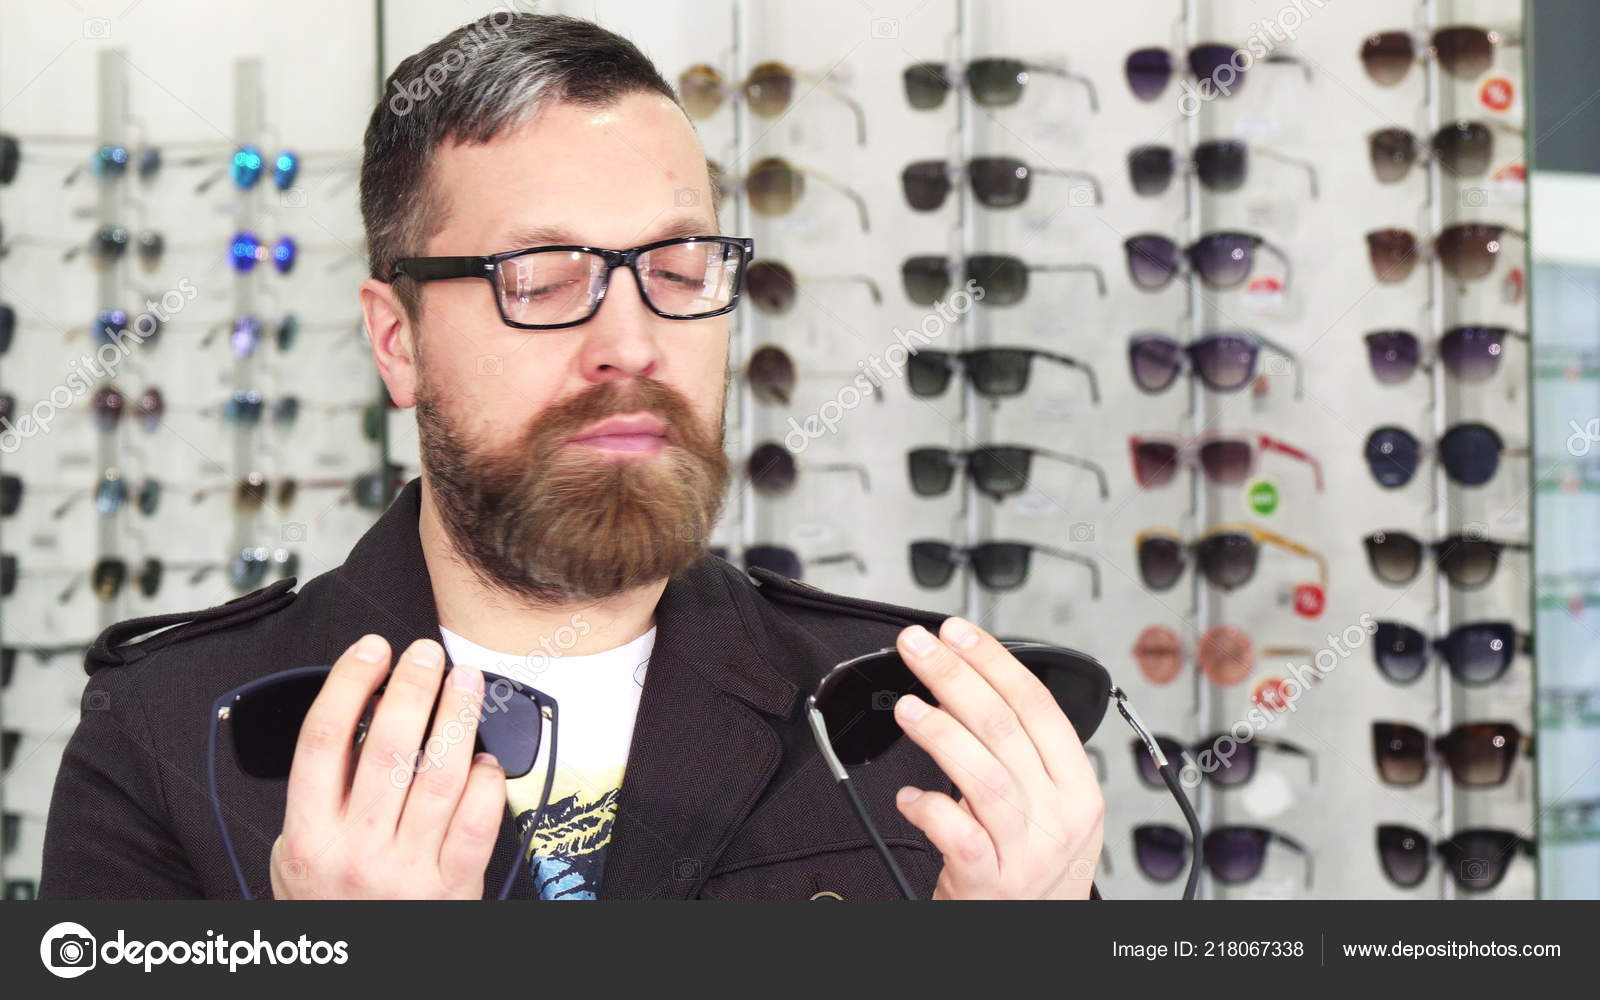 Barbudo macho cliente escolher entre dois pares de óculos de sol comprar  óculos para o consumismo de loja de optometristas compra compra cliente  compra ... de5060c888